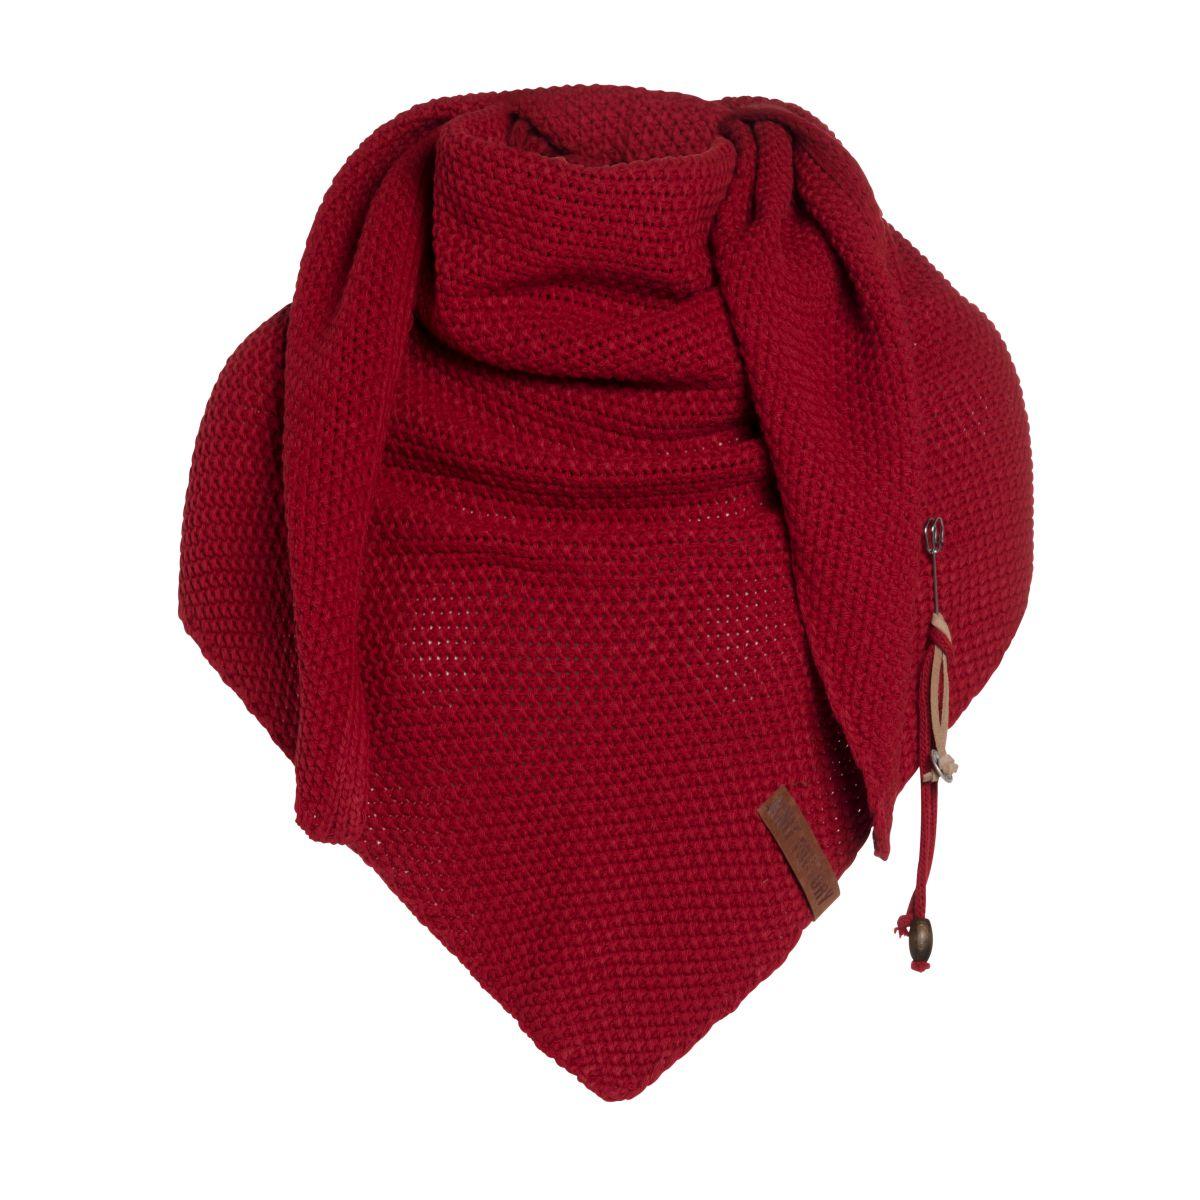 knit factory 1206003 coco omslagdoek bordeaux 1